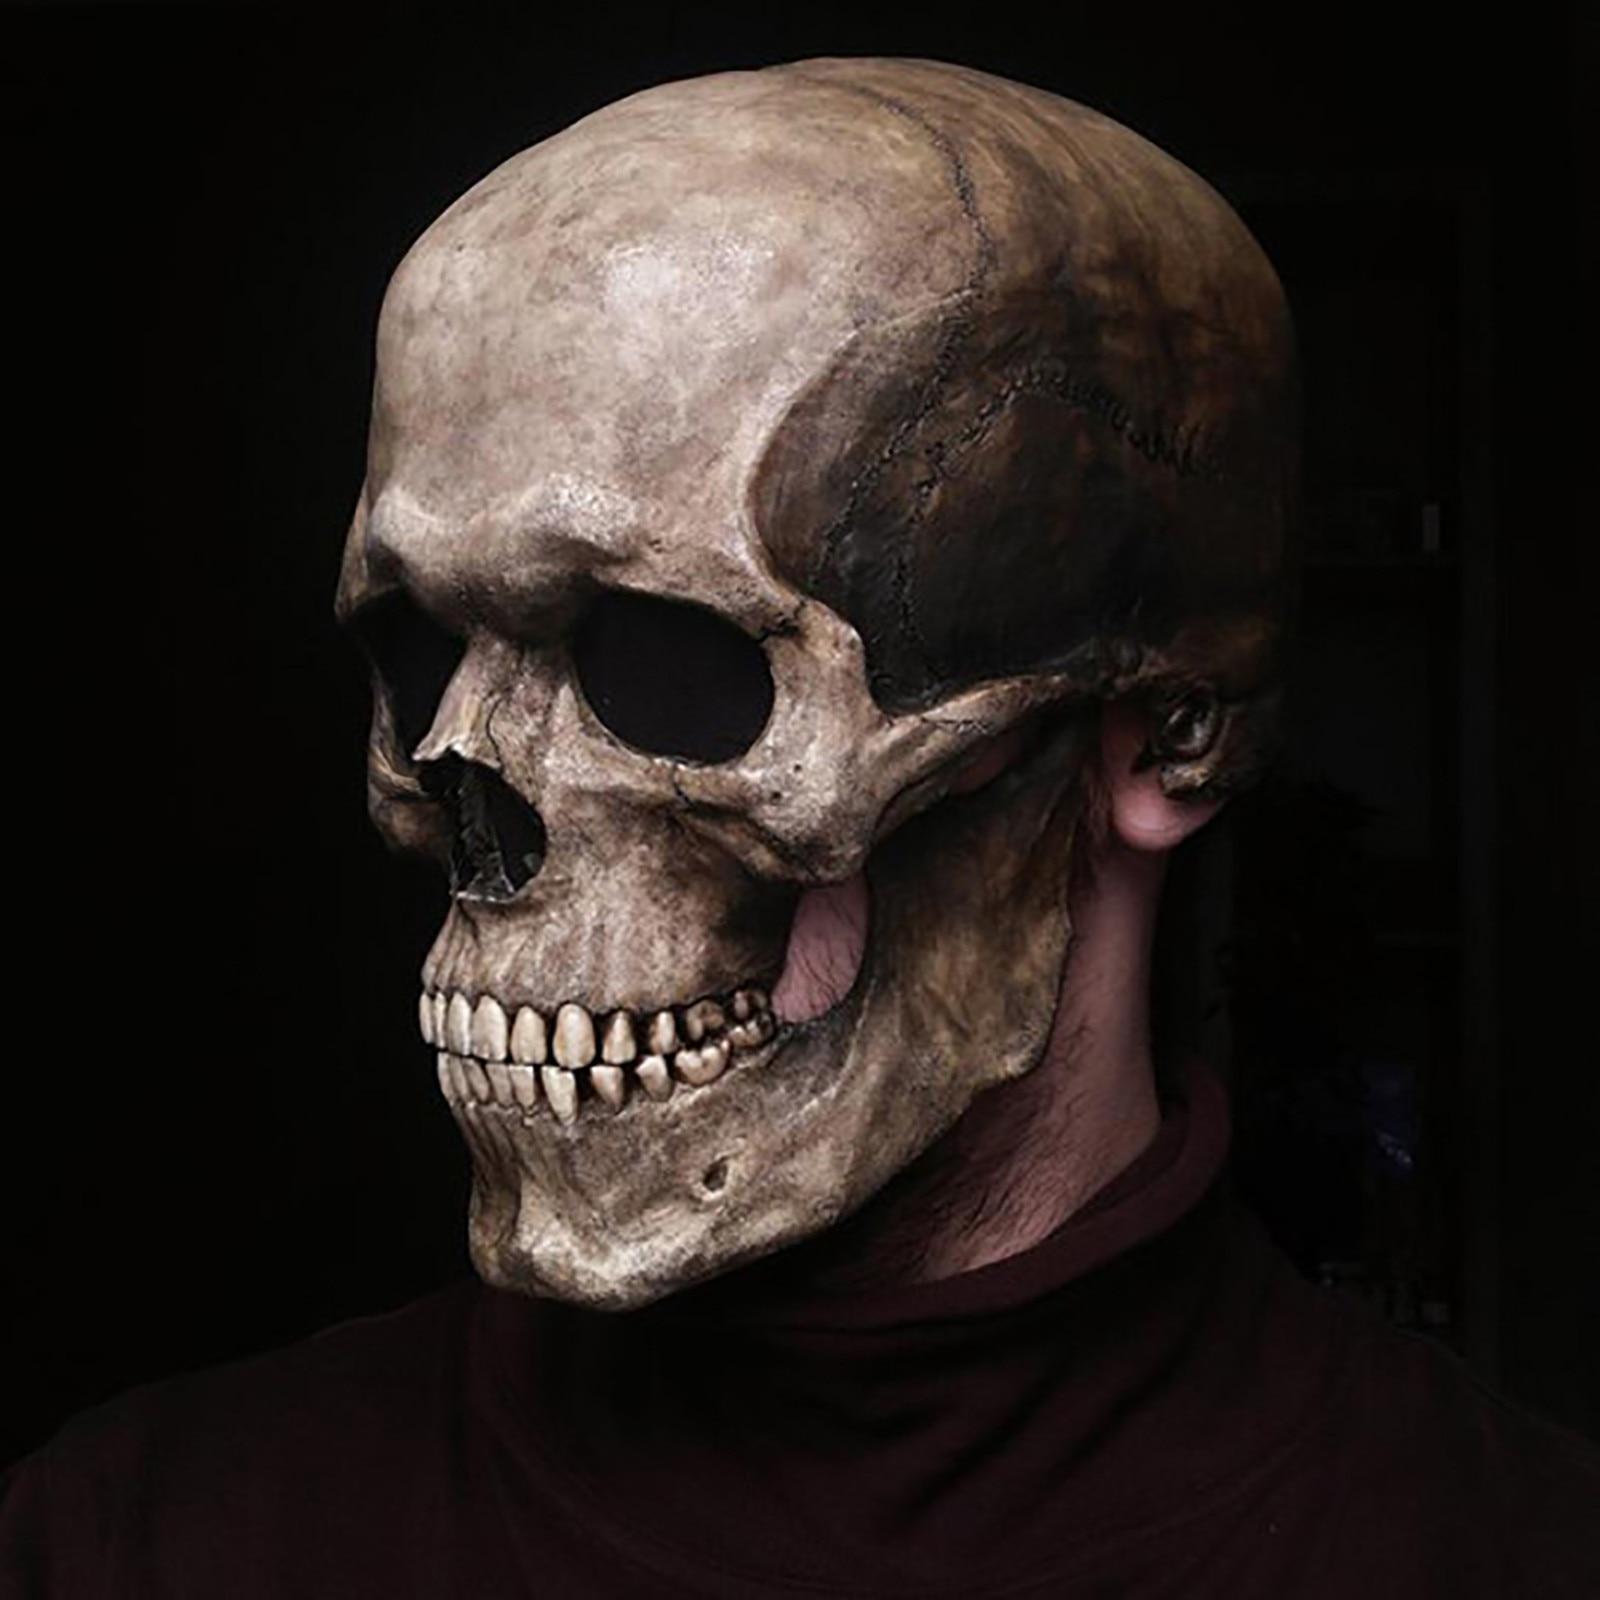 2021 Halloween Horror Decoration Full Head Skull Mask/Helmet Toys Movable Jaw Creative Unisex Funny игрушки для детей